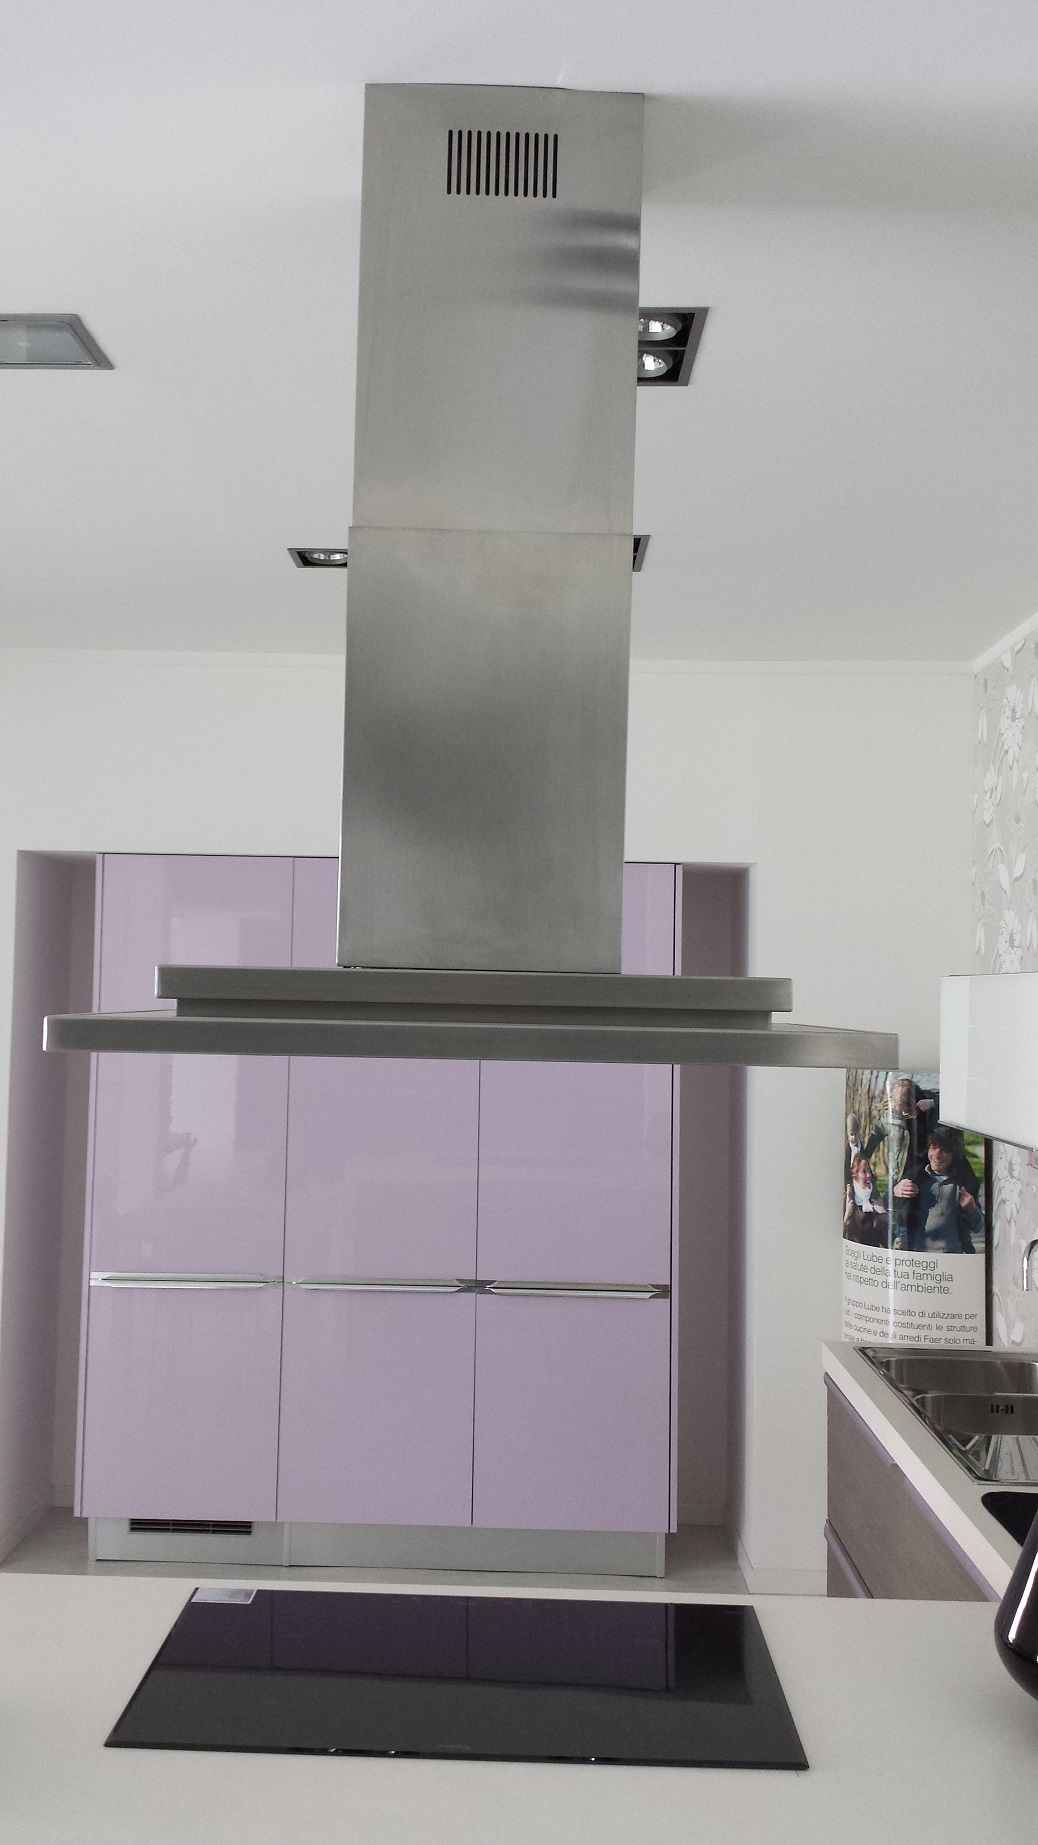 Emejing Cucina Lube Fabiana Ideas - Ideas & Design 2017 ...